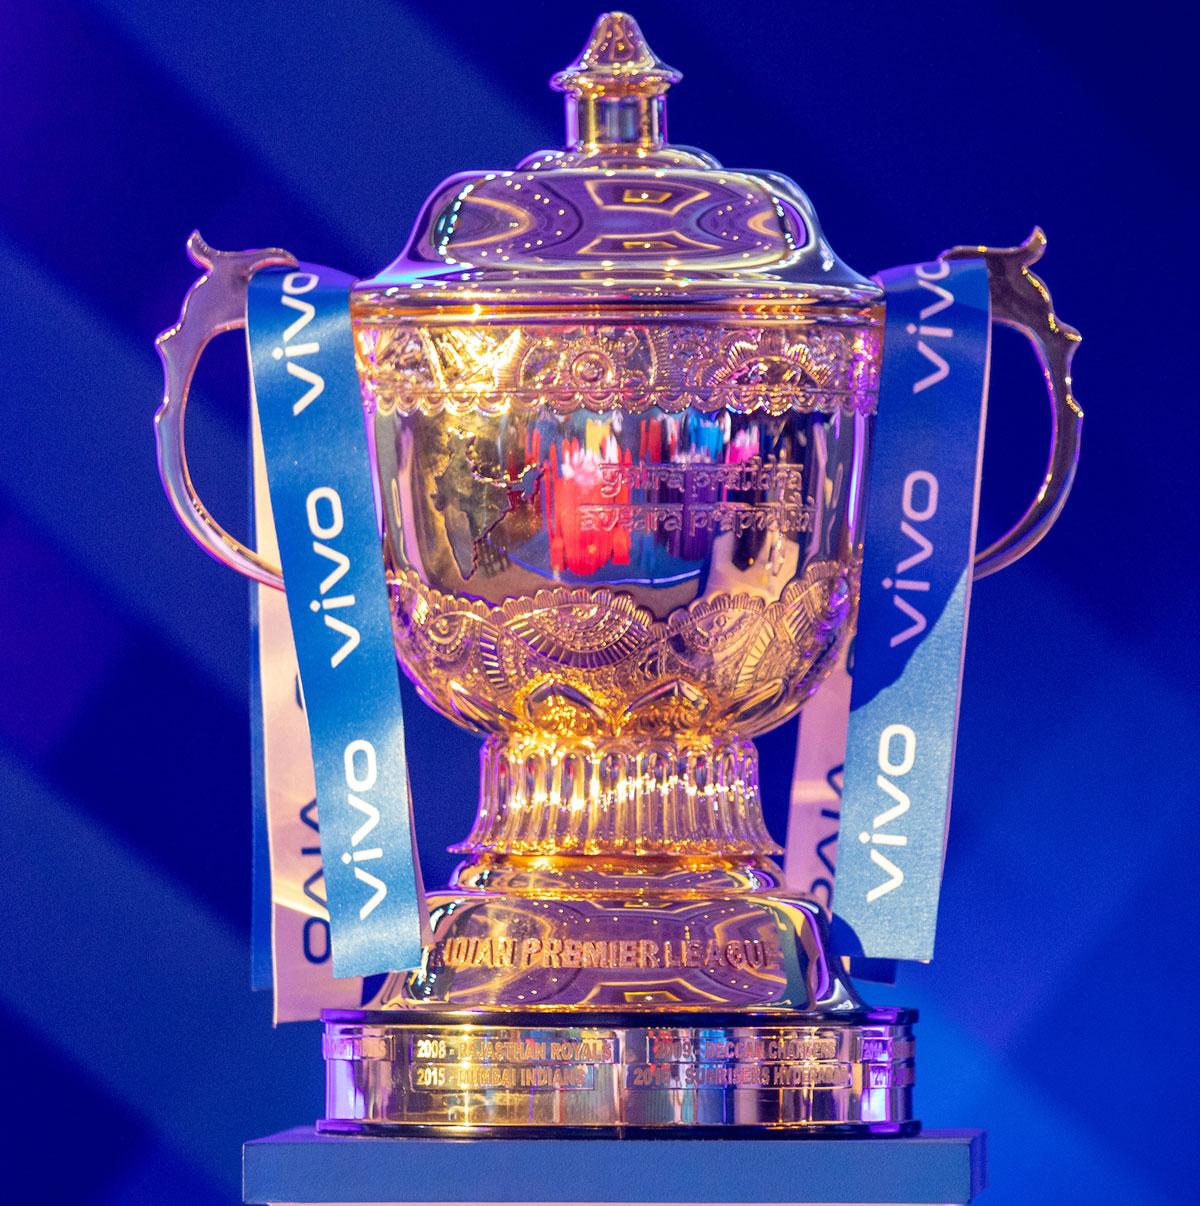 UAE to host remainder of IPL 2021, BCCI confirms